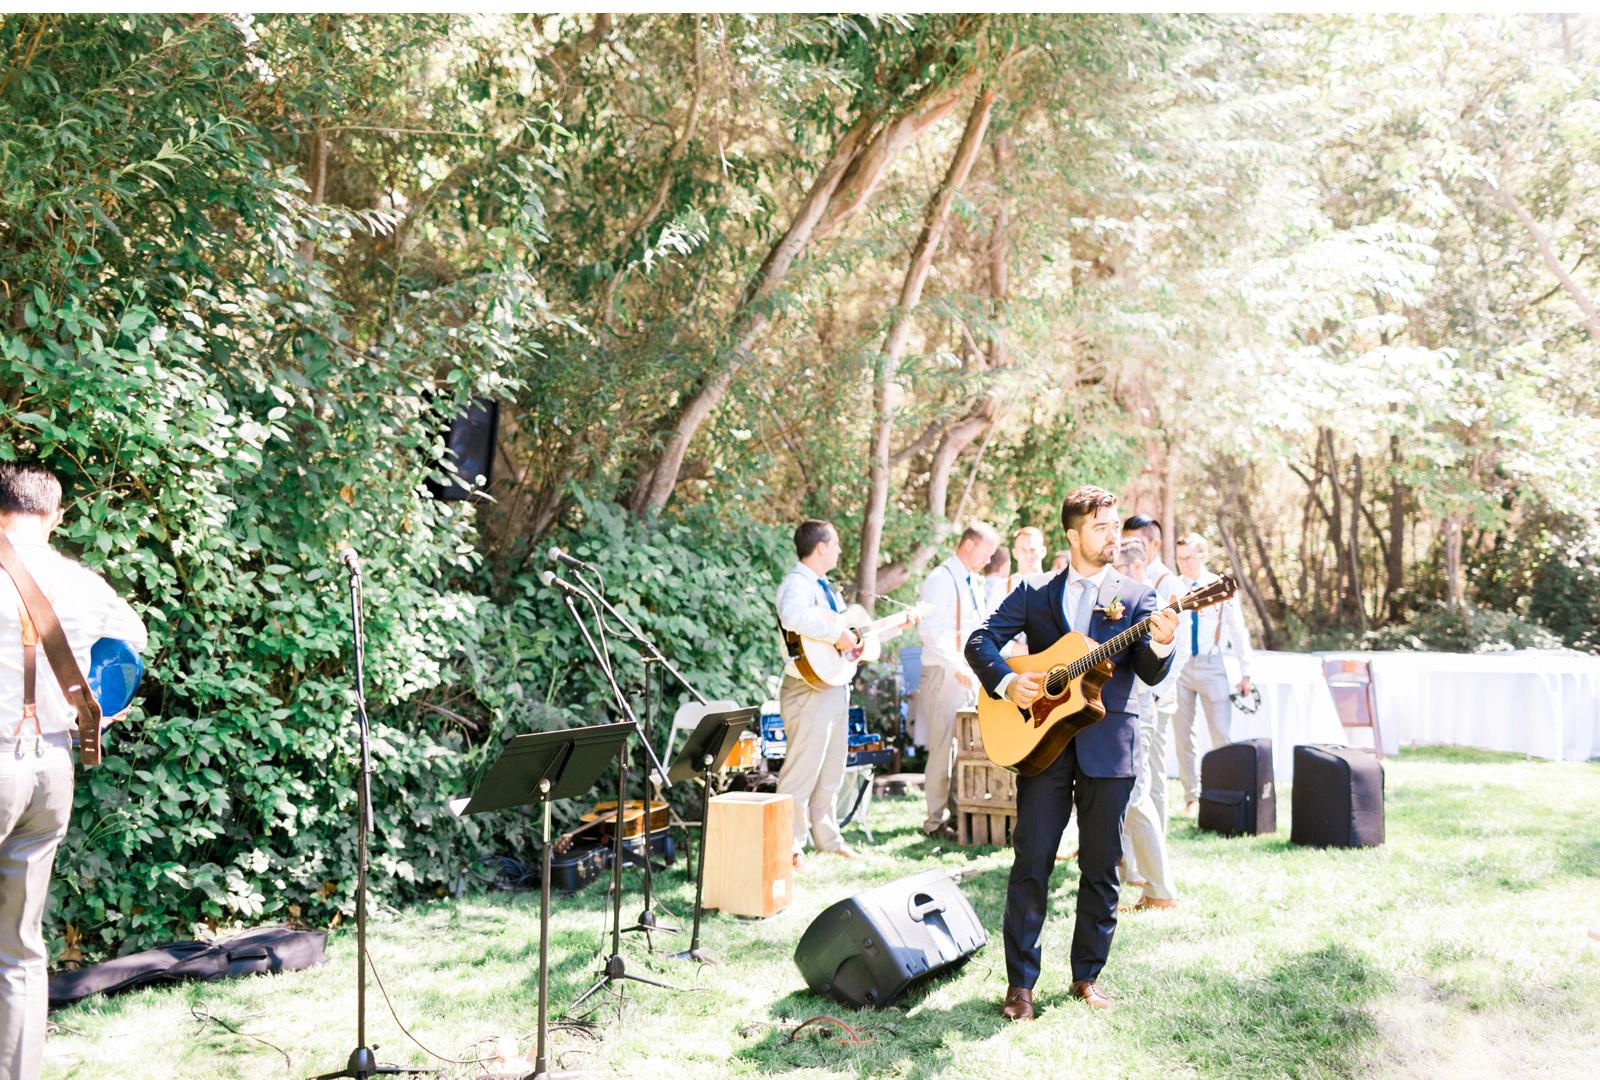 Sea-Canyon-Fruit-Ranch-Wedding-Natalie-Schutt-Photography_15.jpg